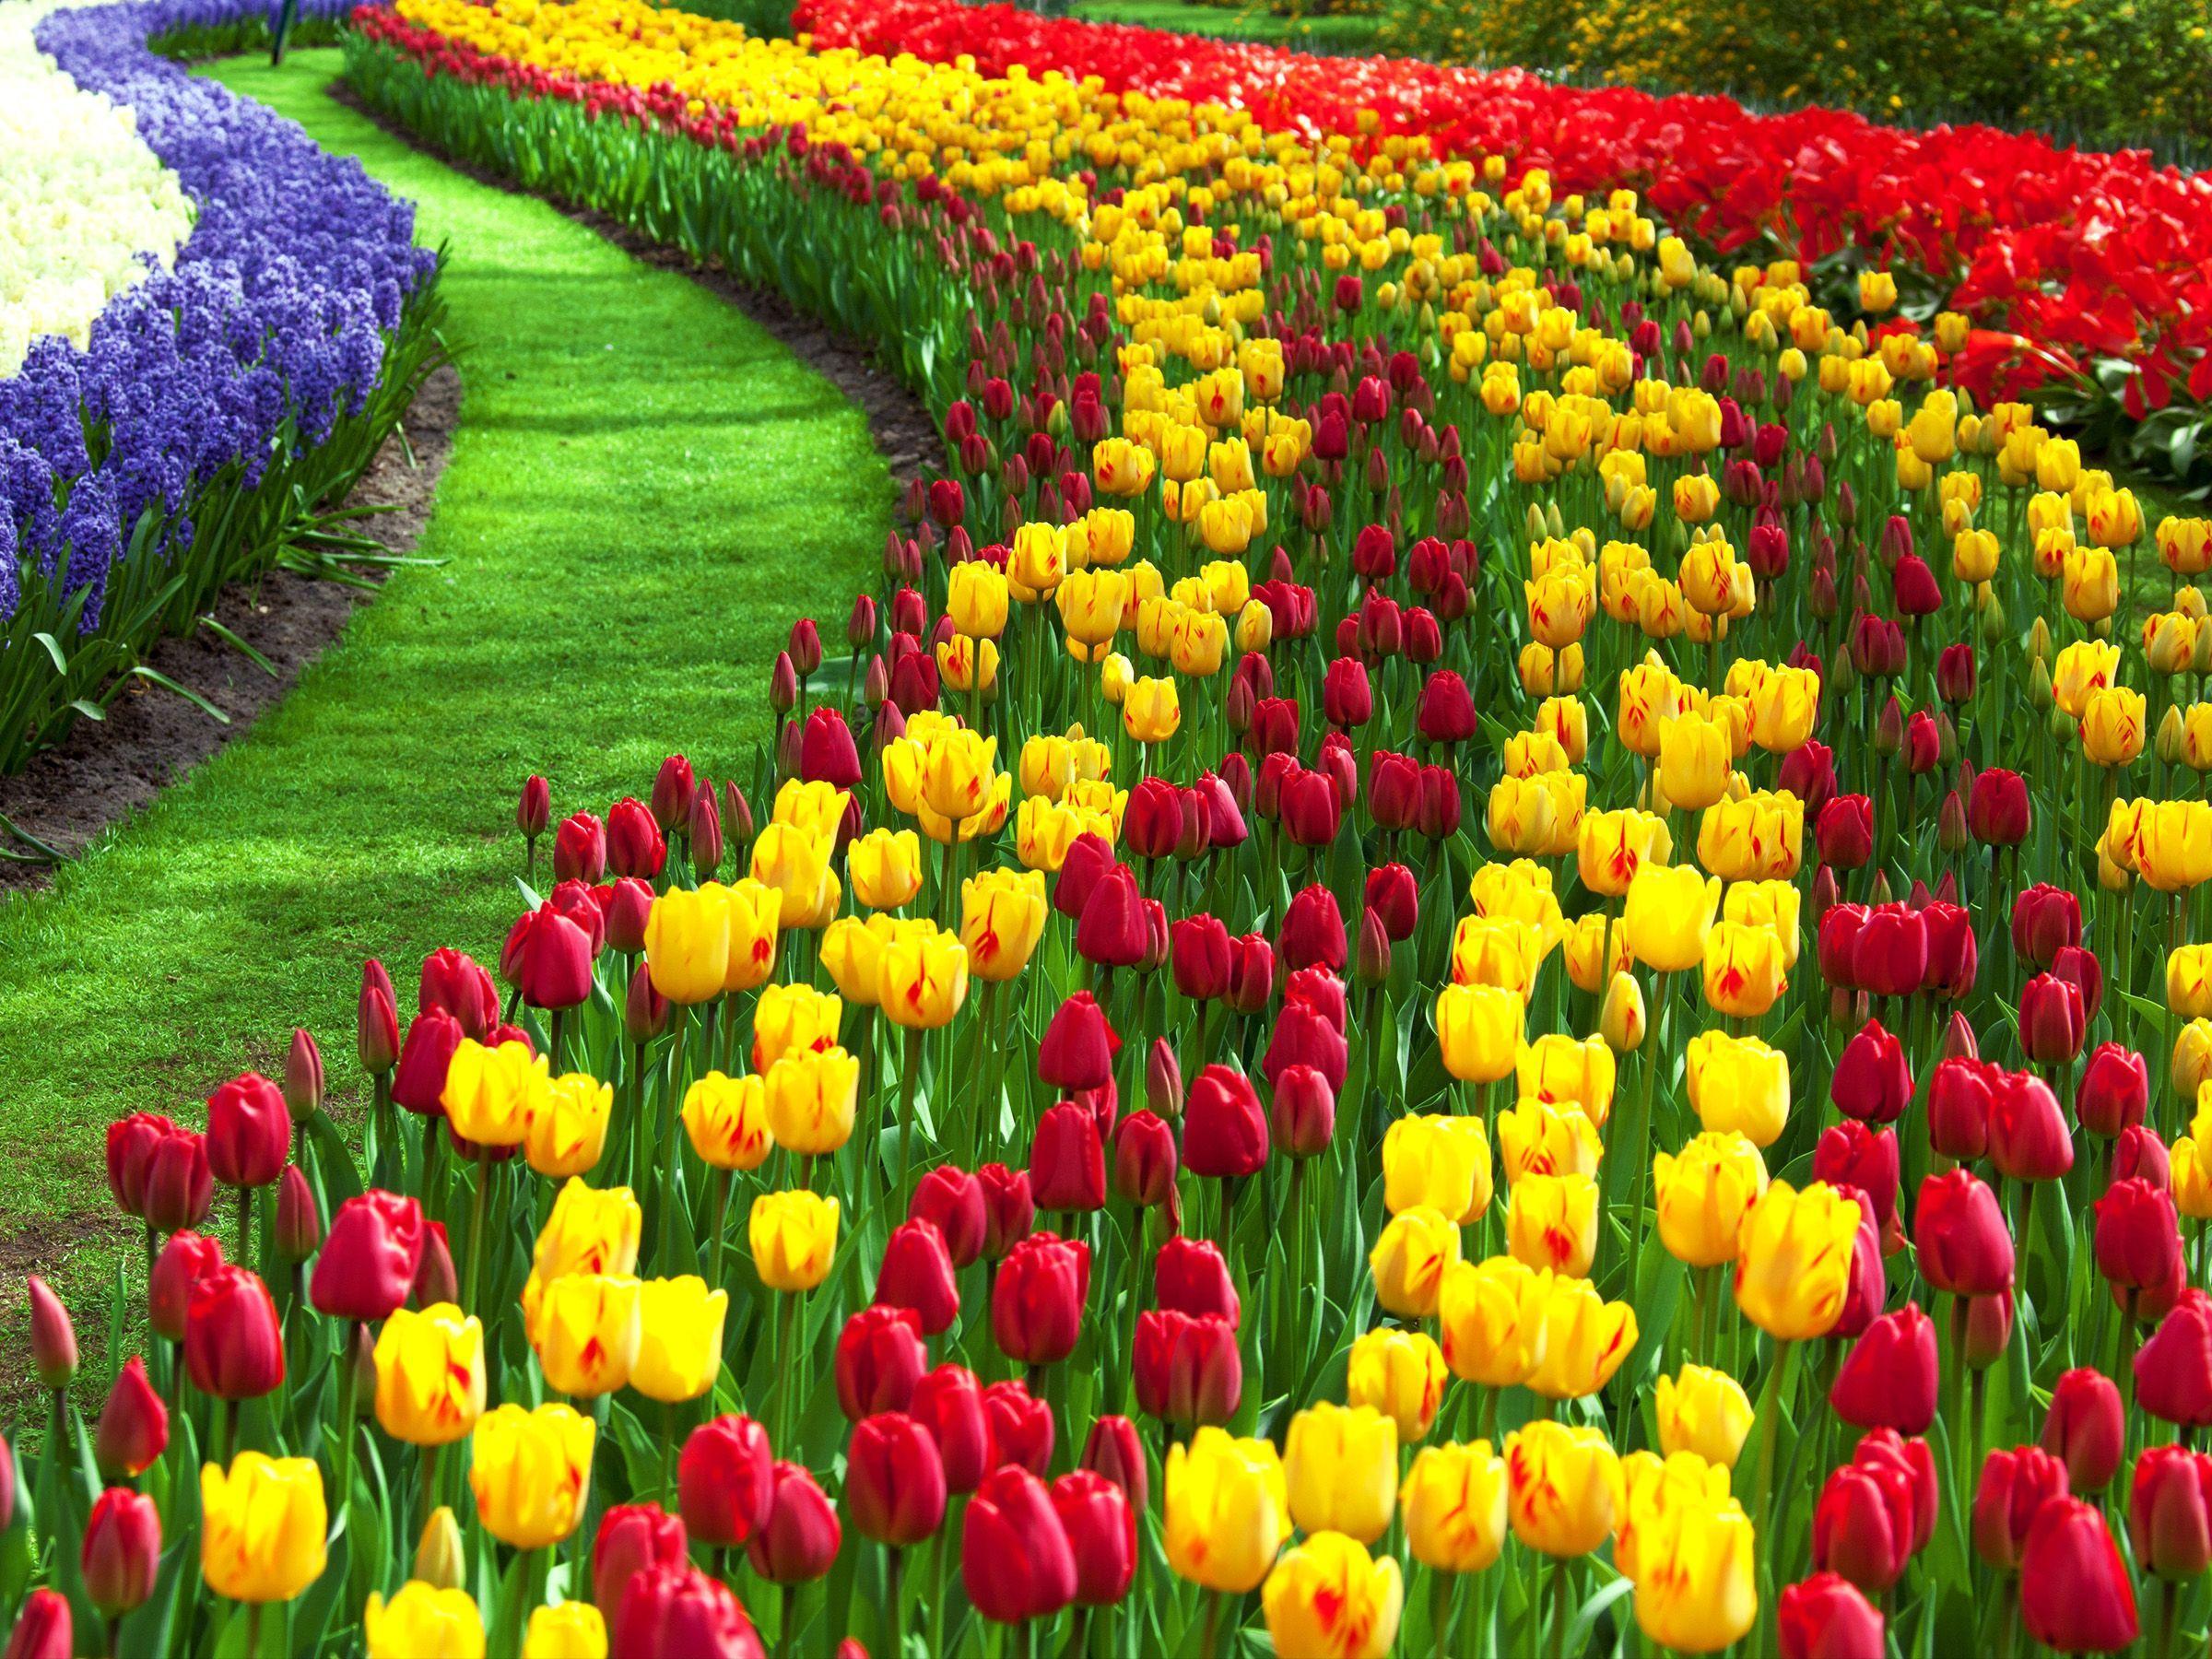 Flowers Wallpapers For Desktop Backgrounds Full Screen Wallpaper Cave